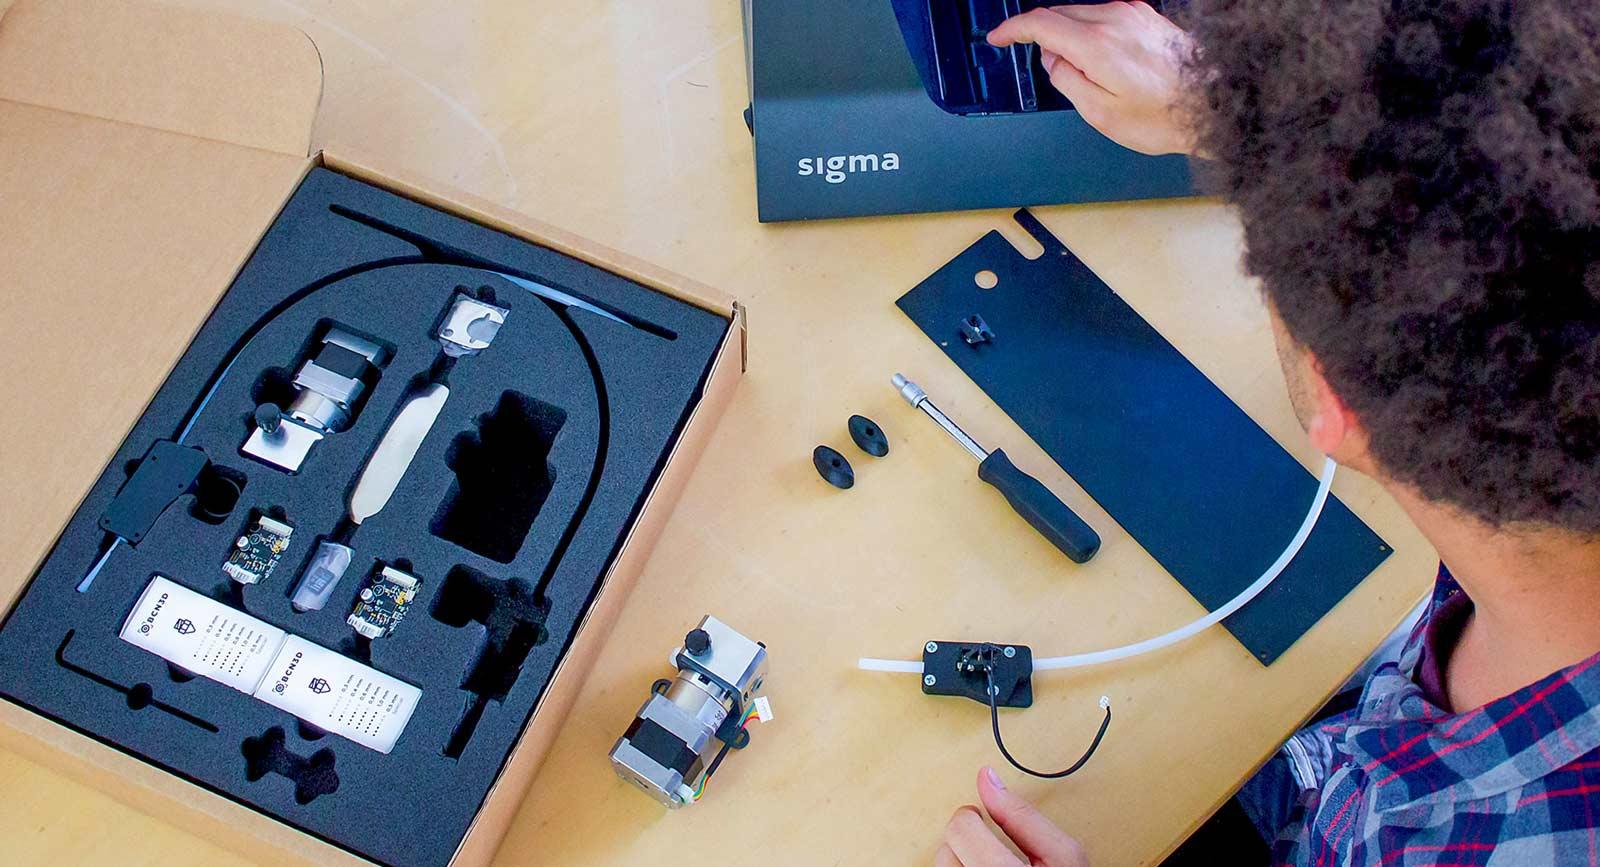 bcn3d-technologies-kit-upgrade-sigma-R19-02